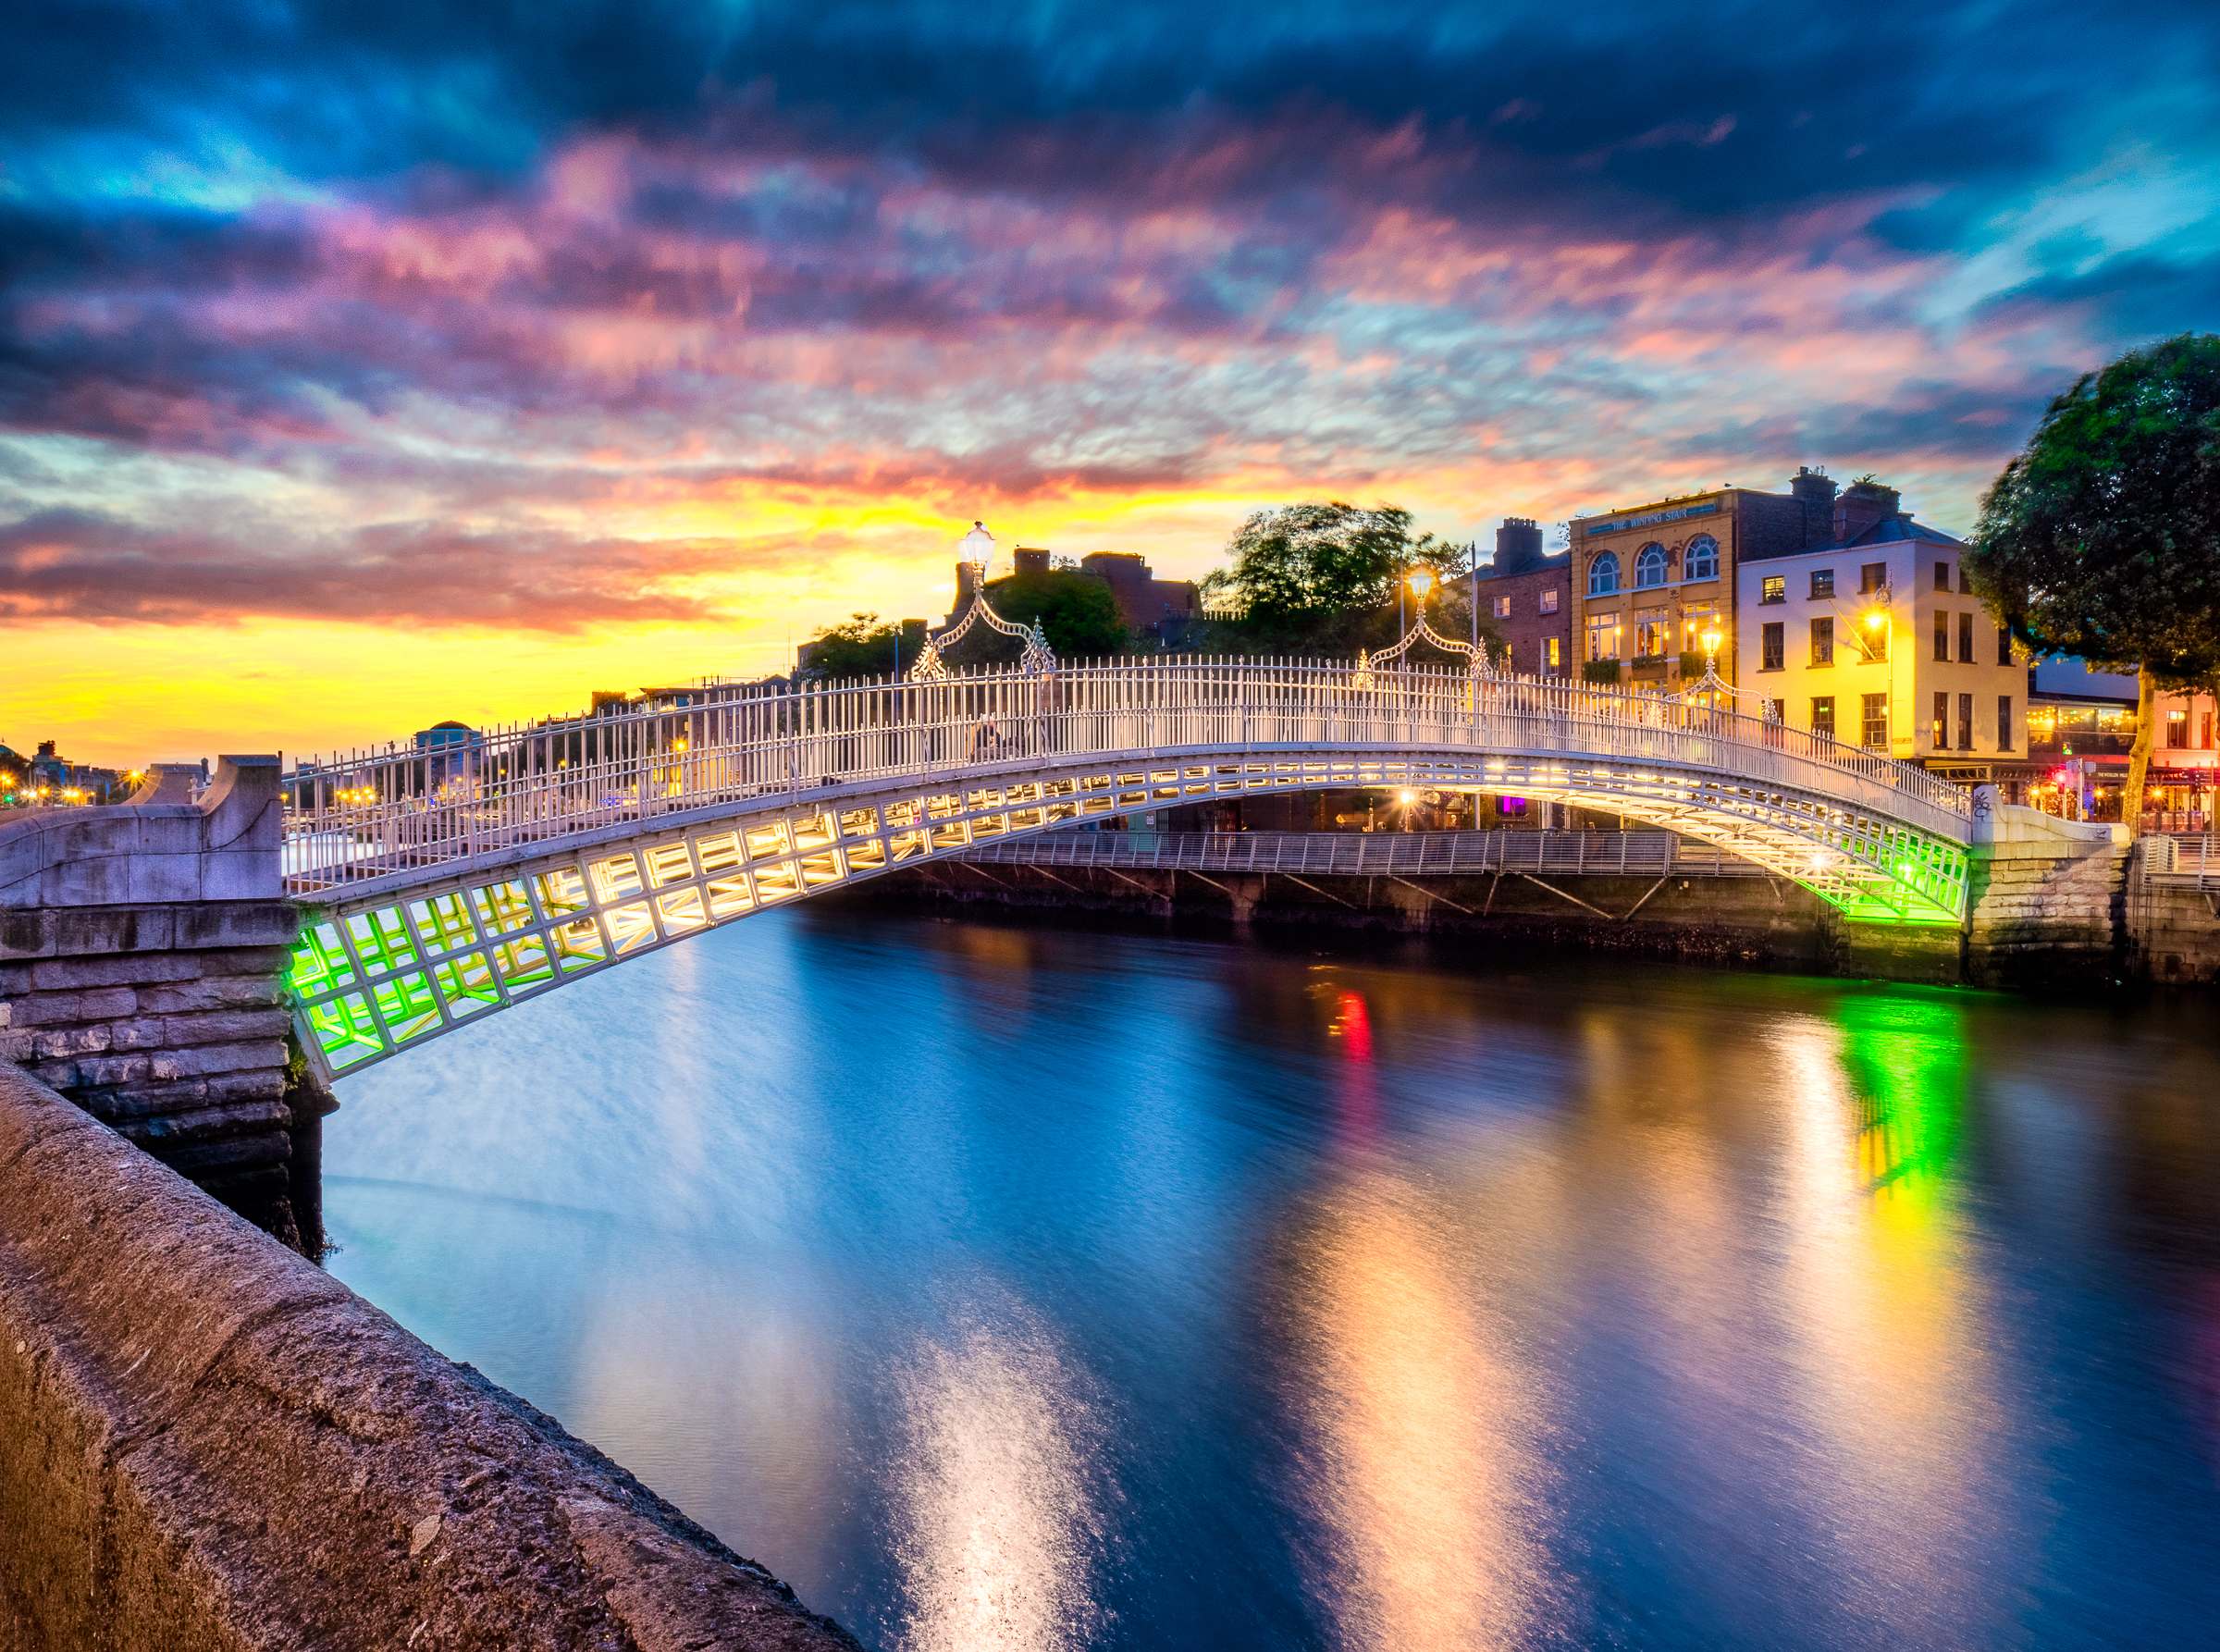 Ha'Penny Bridge at sunset in Dublin Ireland